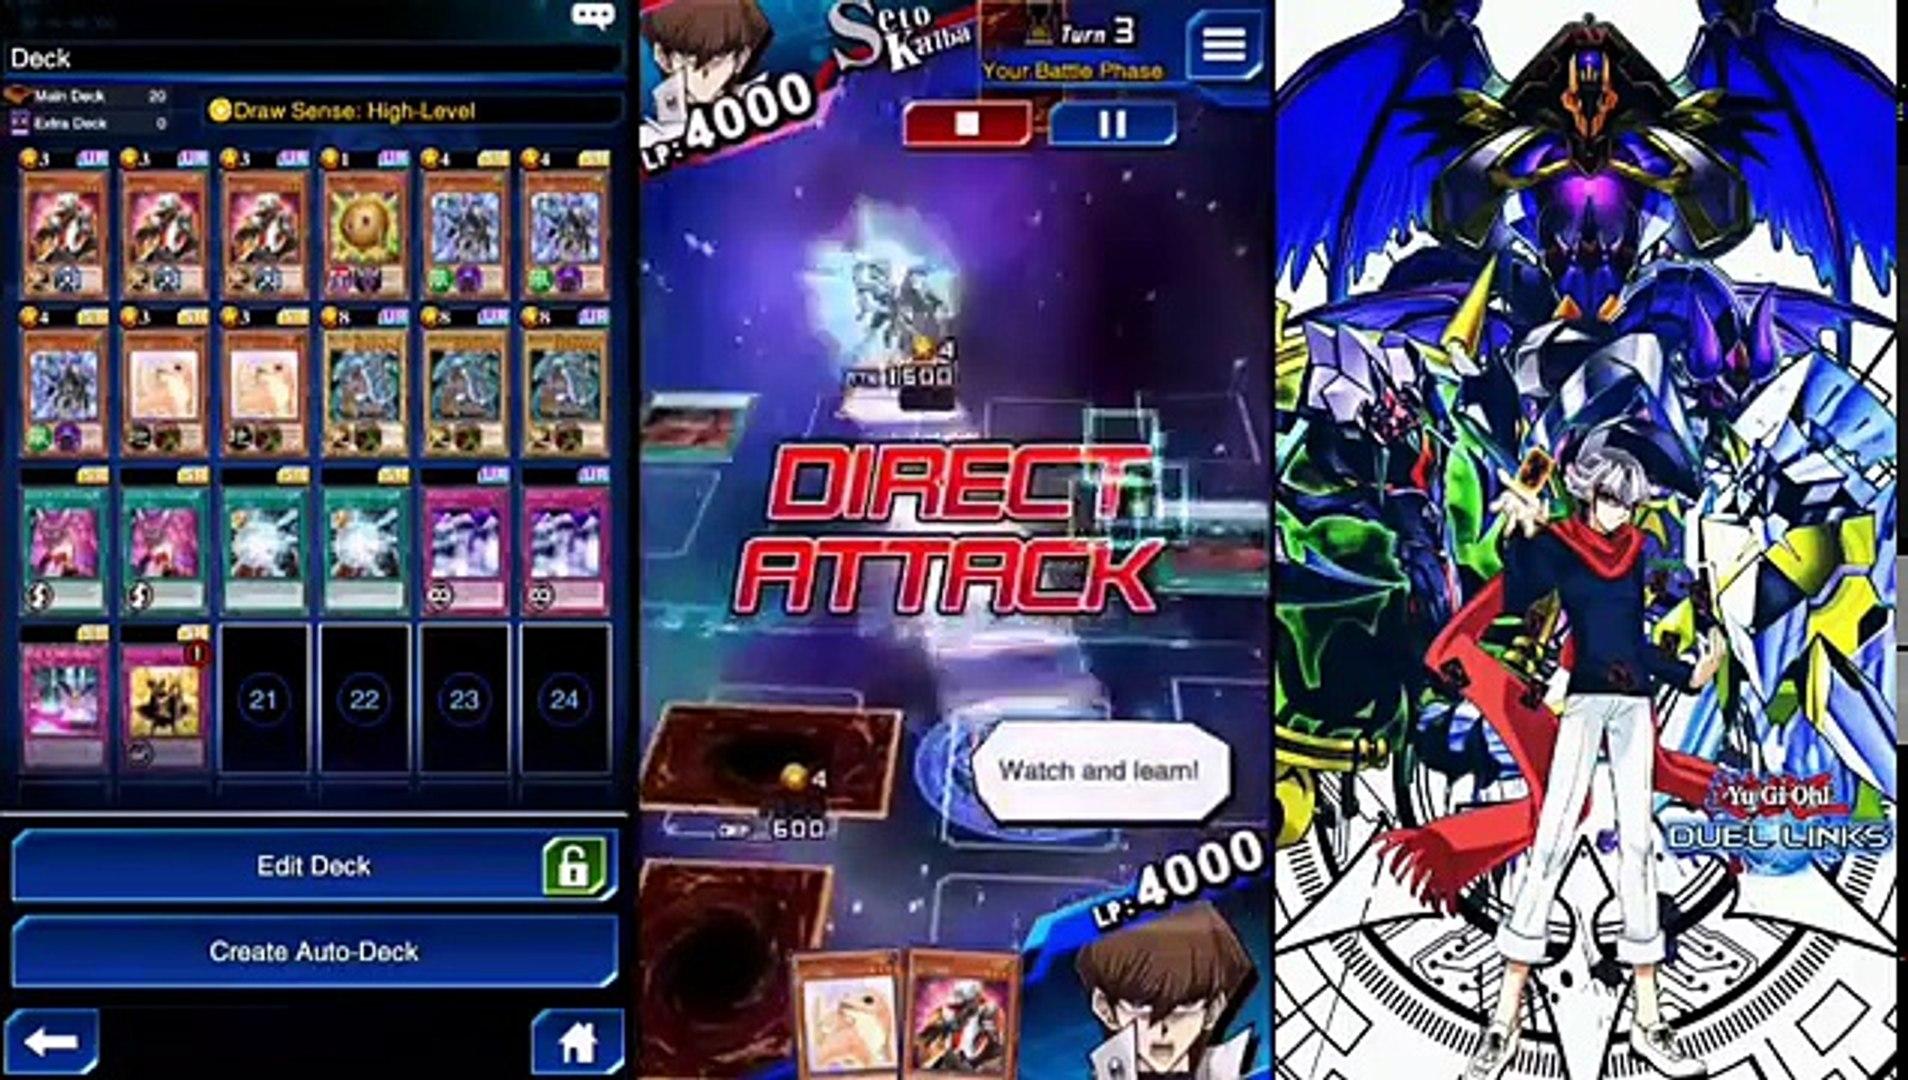 [Yu-Gi-Oh! Duel Links] The Best KOG Deck| New Blue Eyes White Dragon Deck